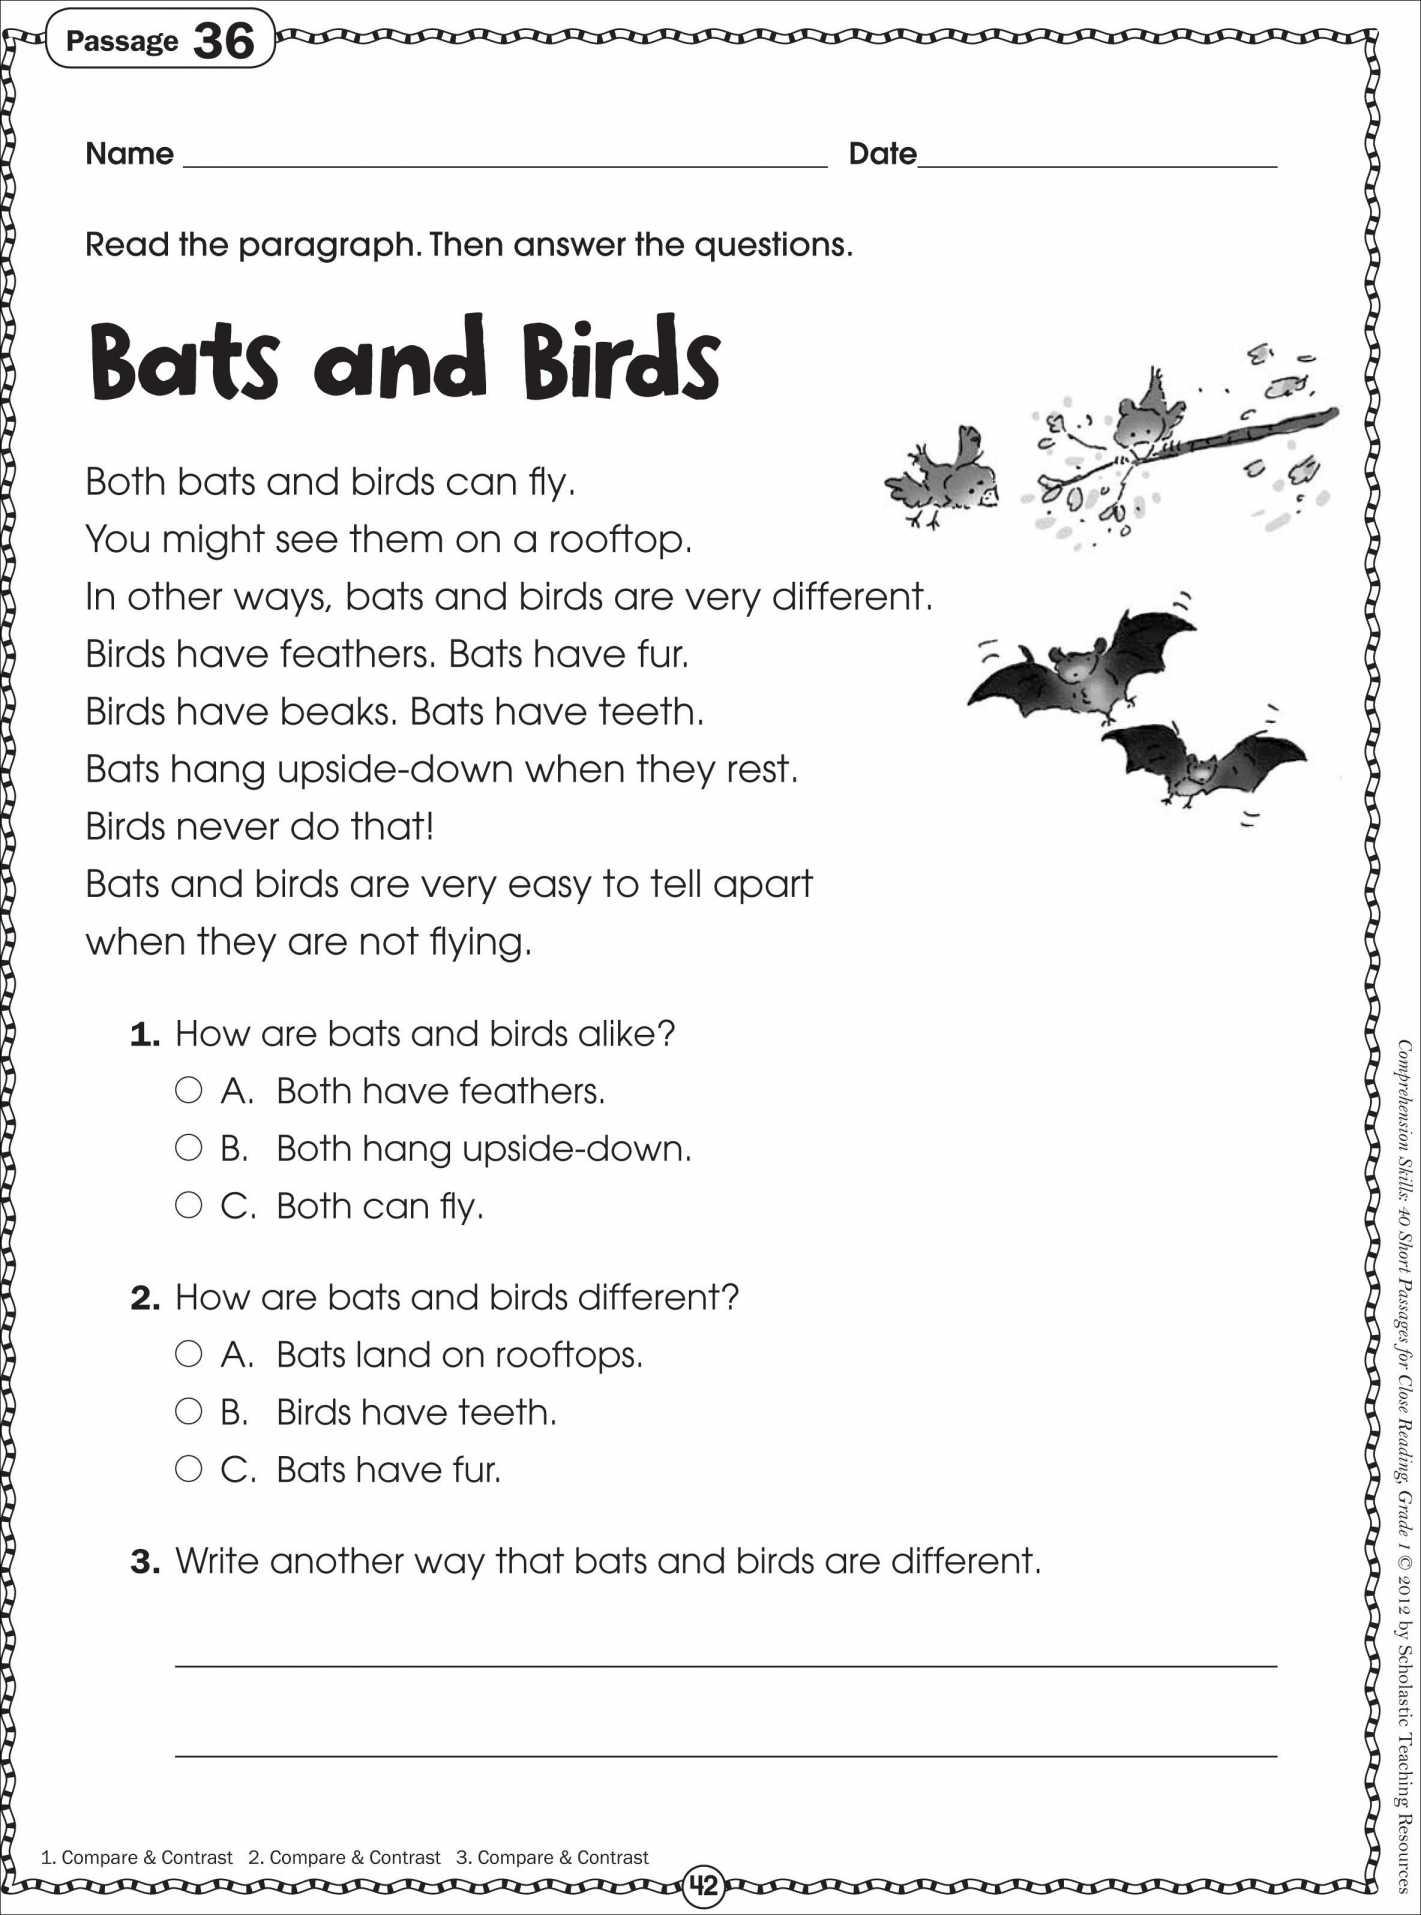 Free Printable Second Grade Reading Comprehension Worksheets   Second Grade Reading Comprehension Printable Worksheets